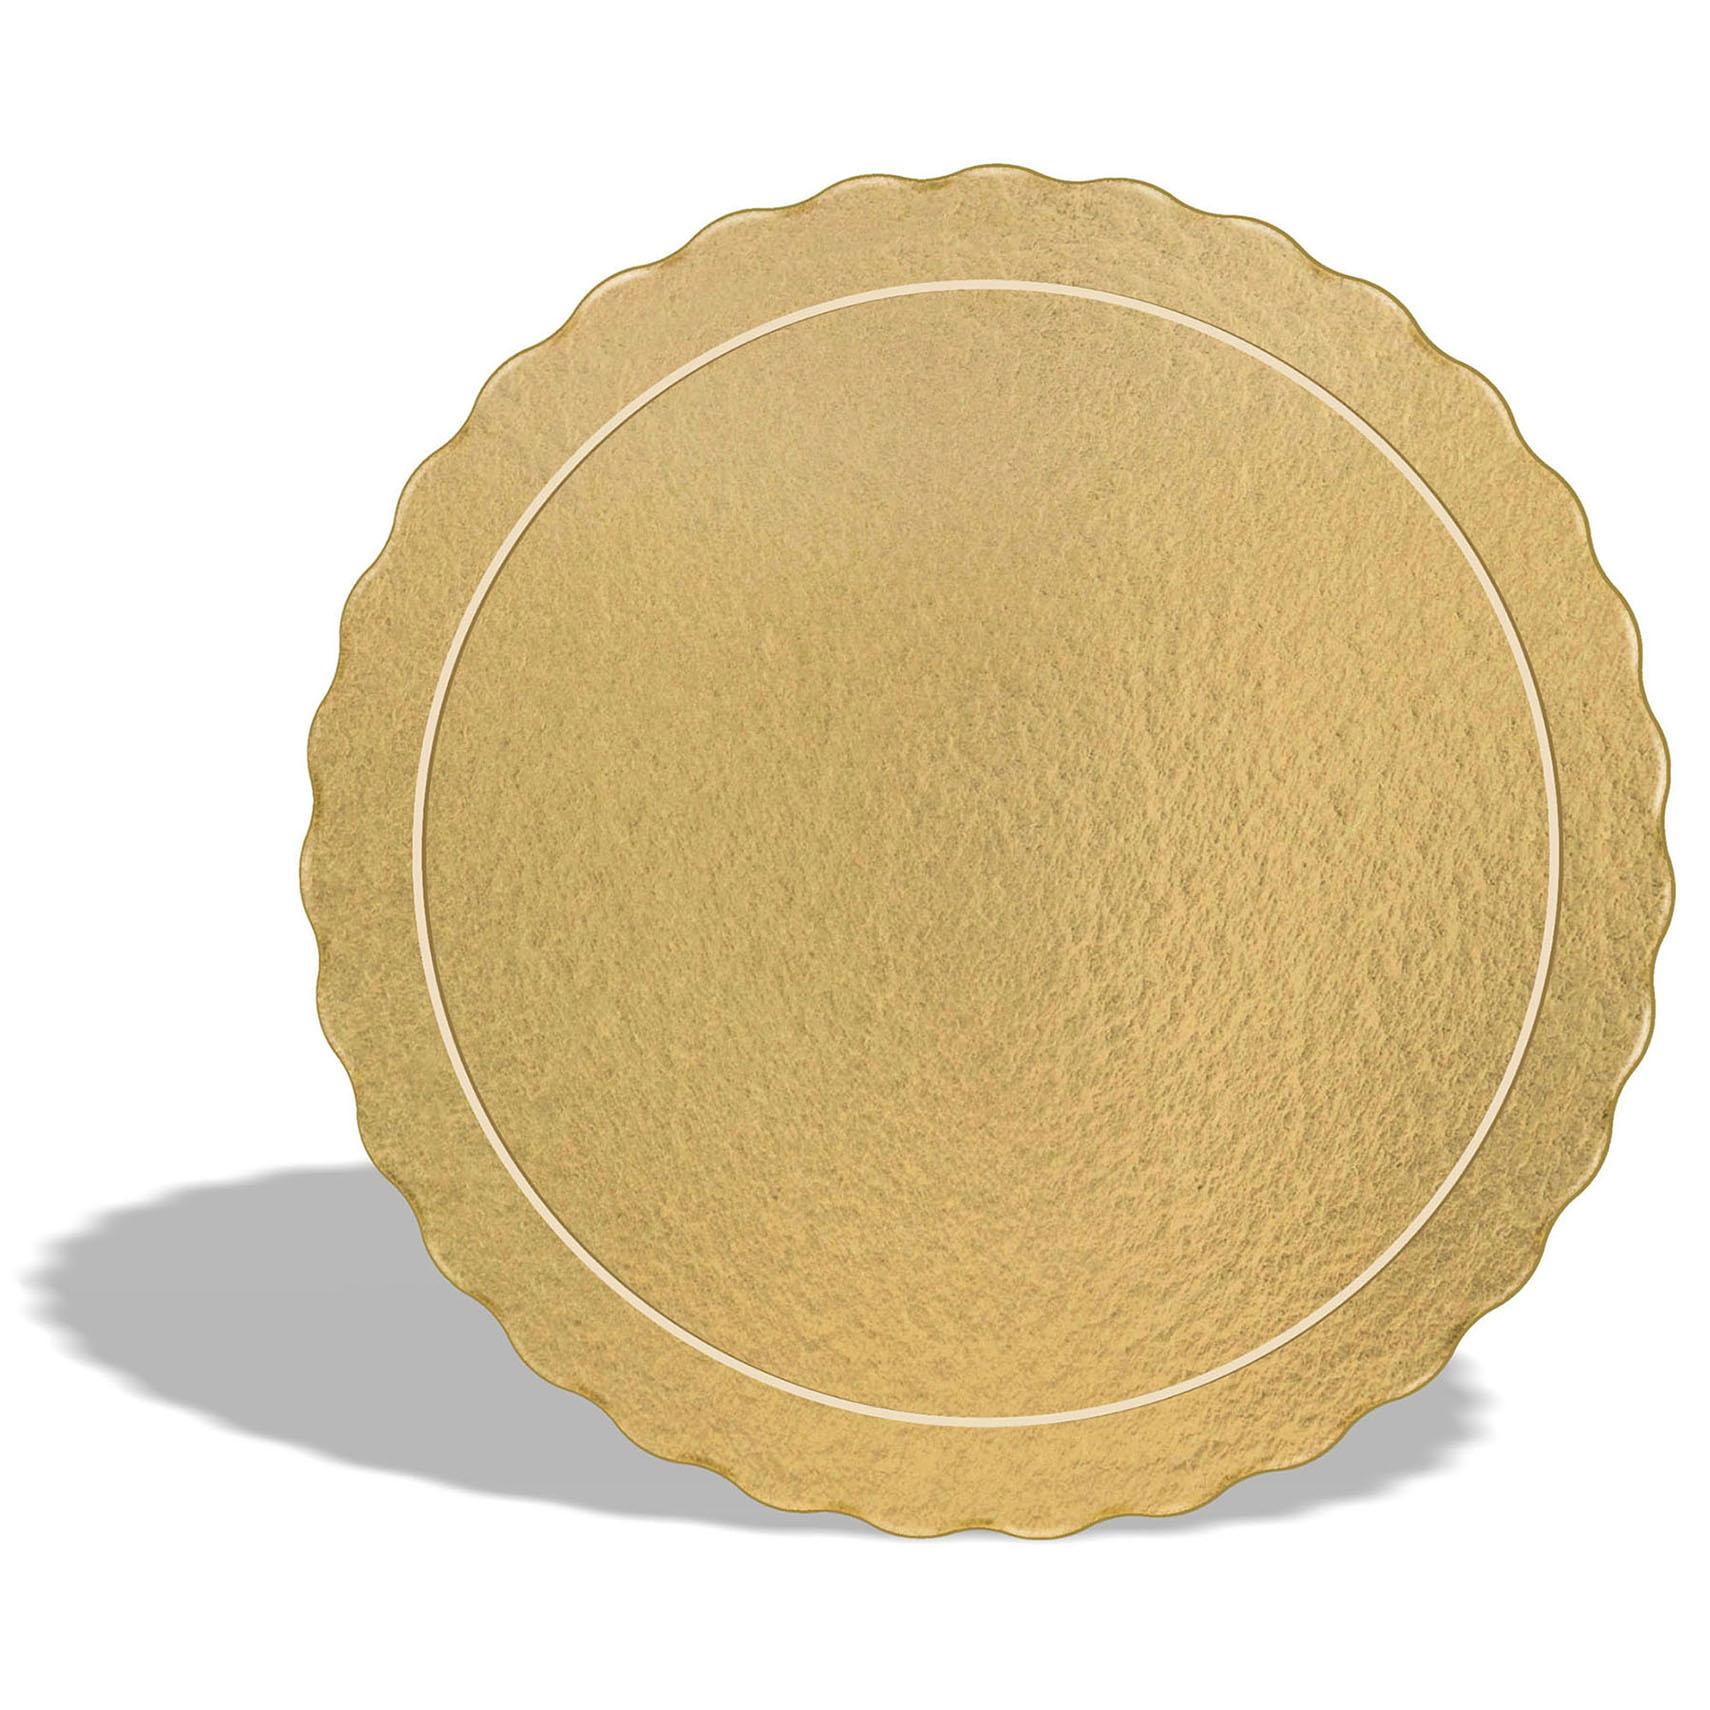 60 Bases Laminadas, Suporte P/ Bolo, Cake Board, Kit 25 e 32cm - Ouro